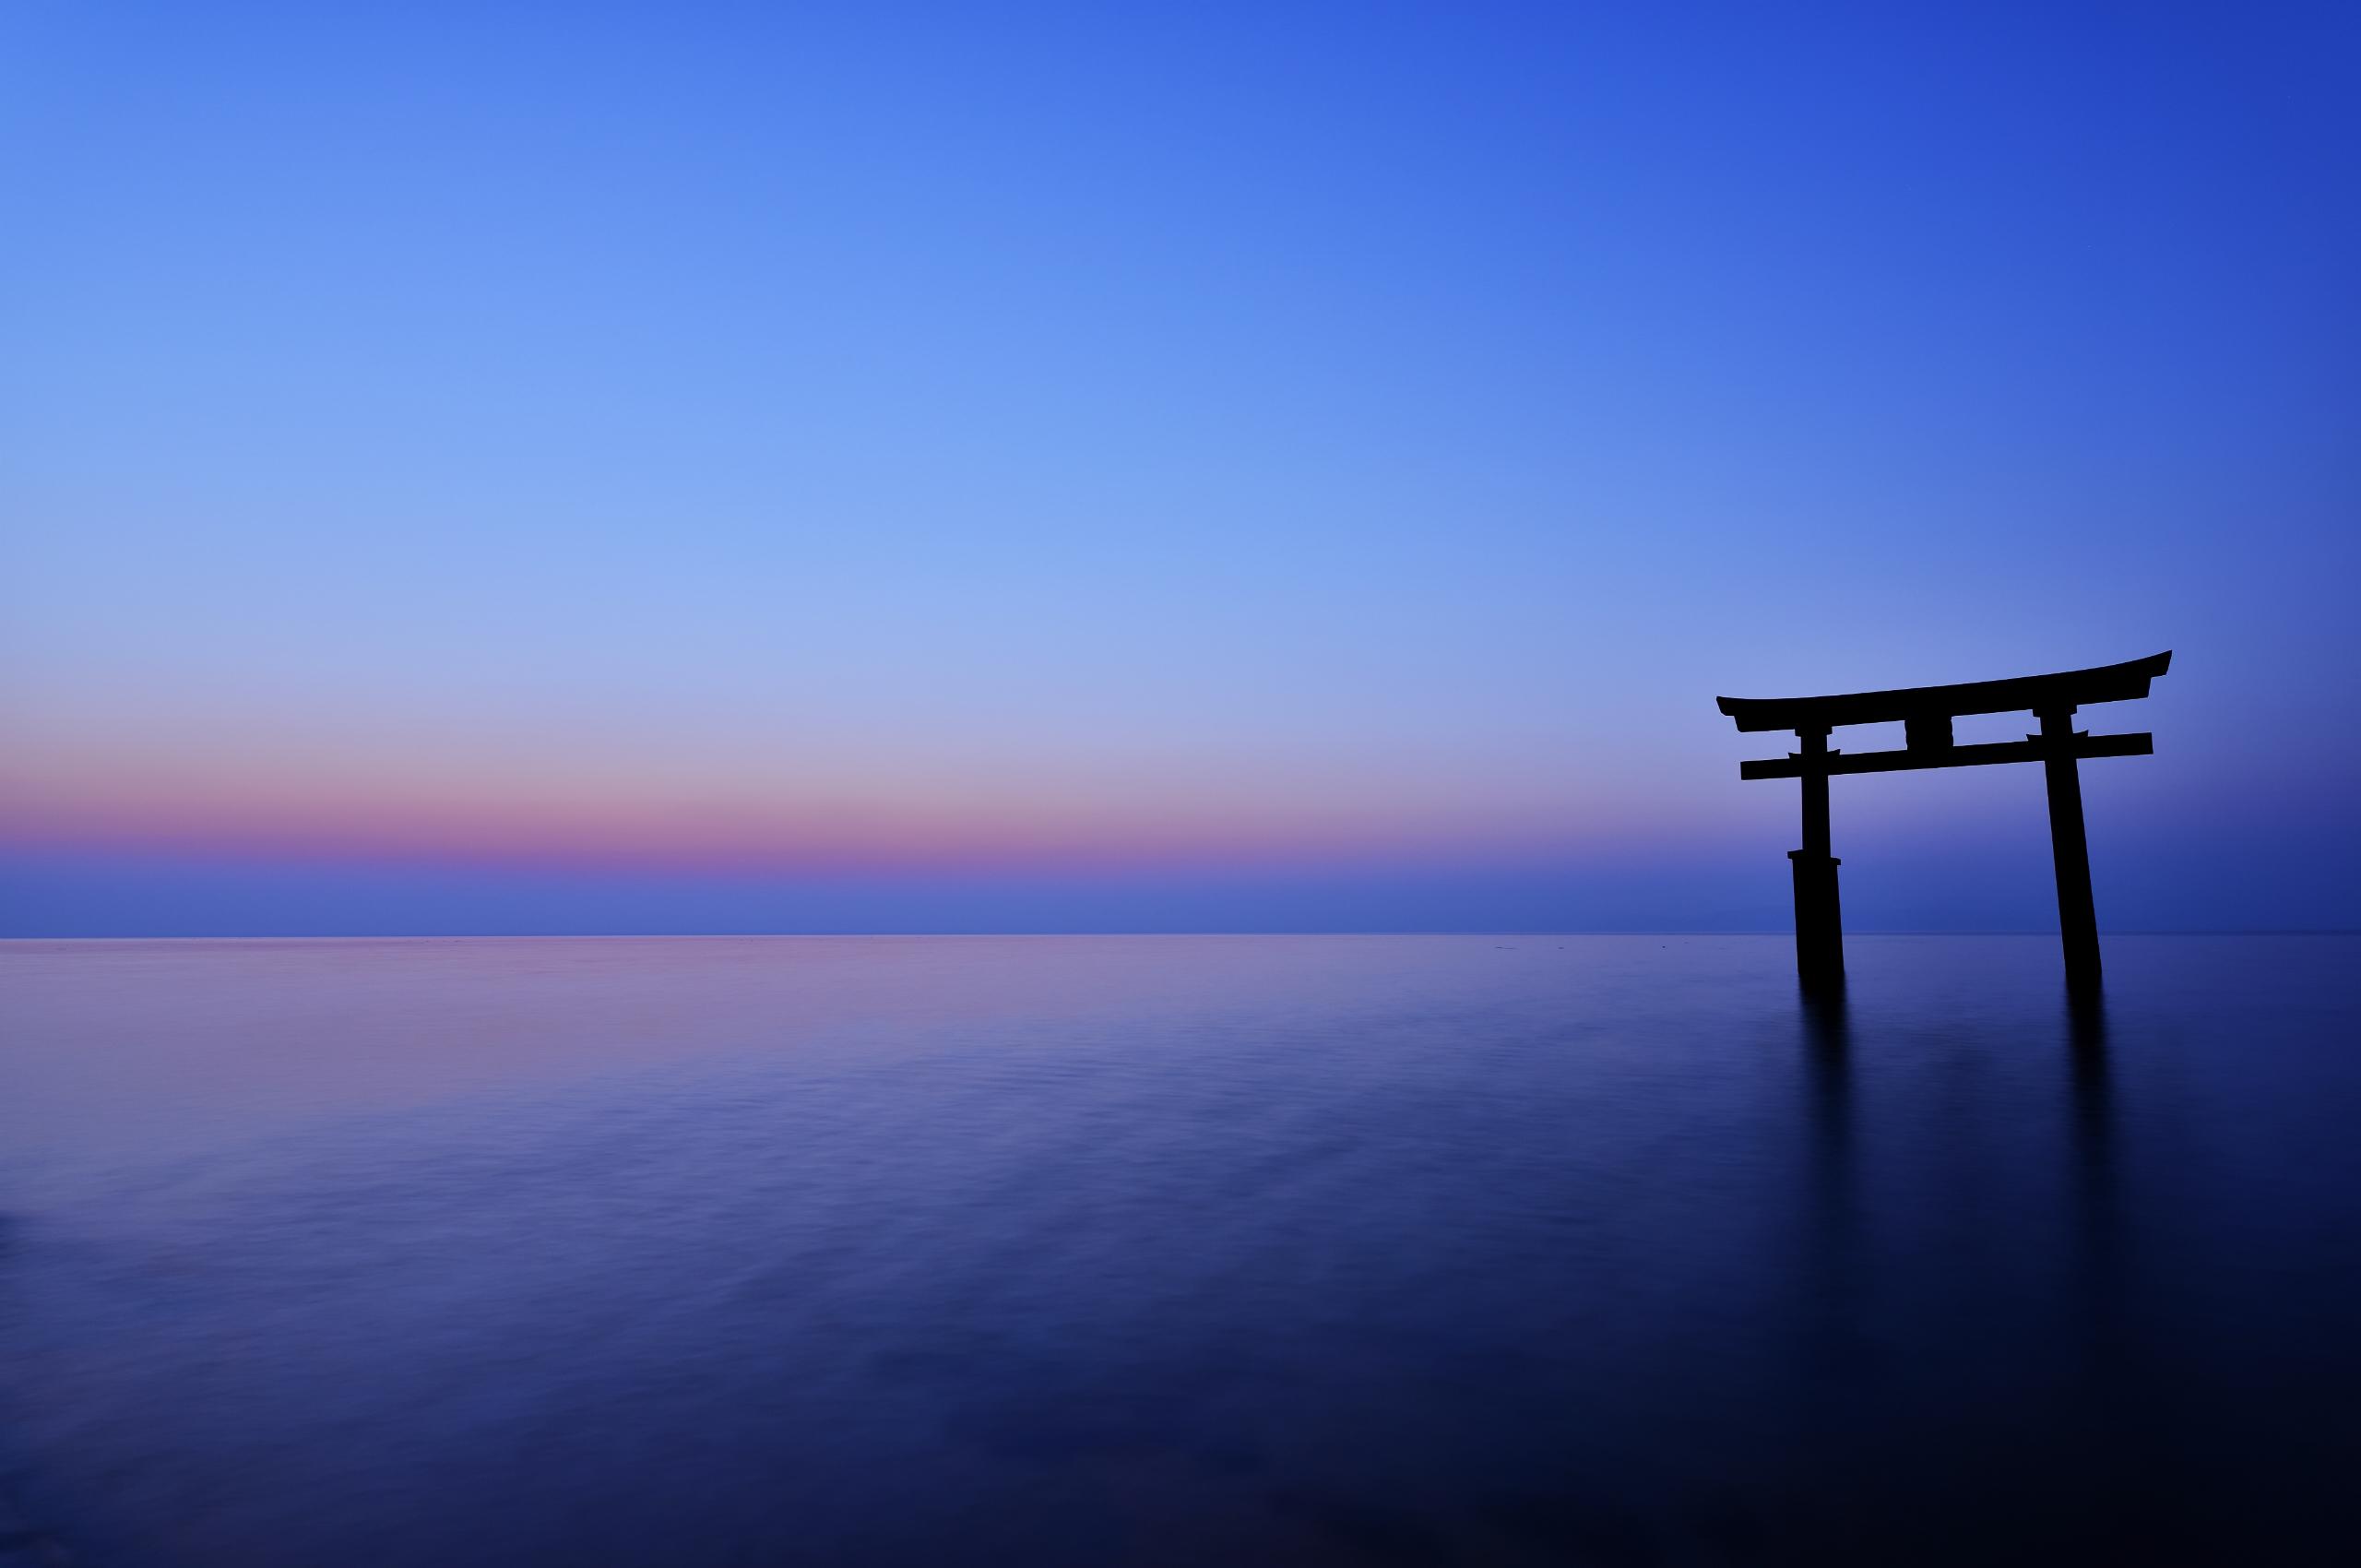 1920x1080 Horizon Sunset Blue Sea Laptop Full HD 1080P HD ...